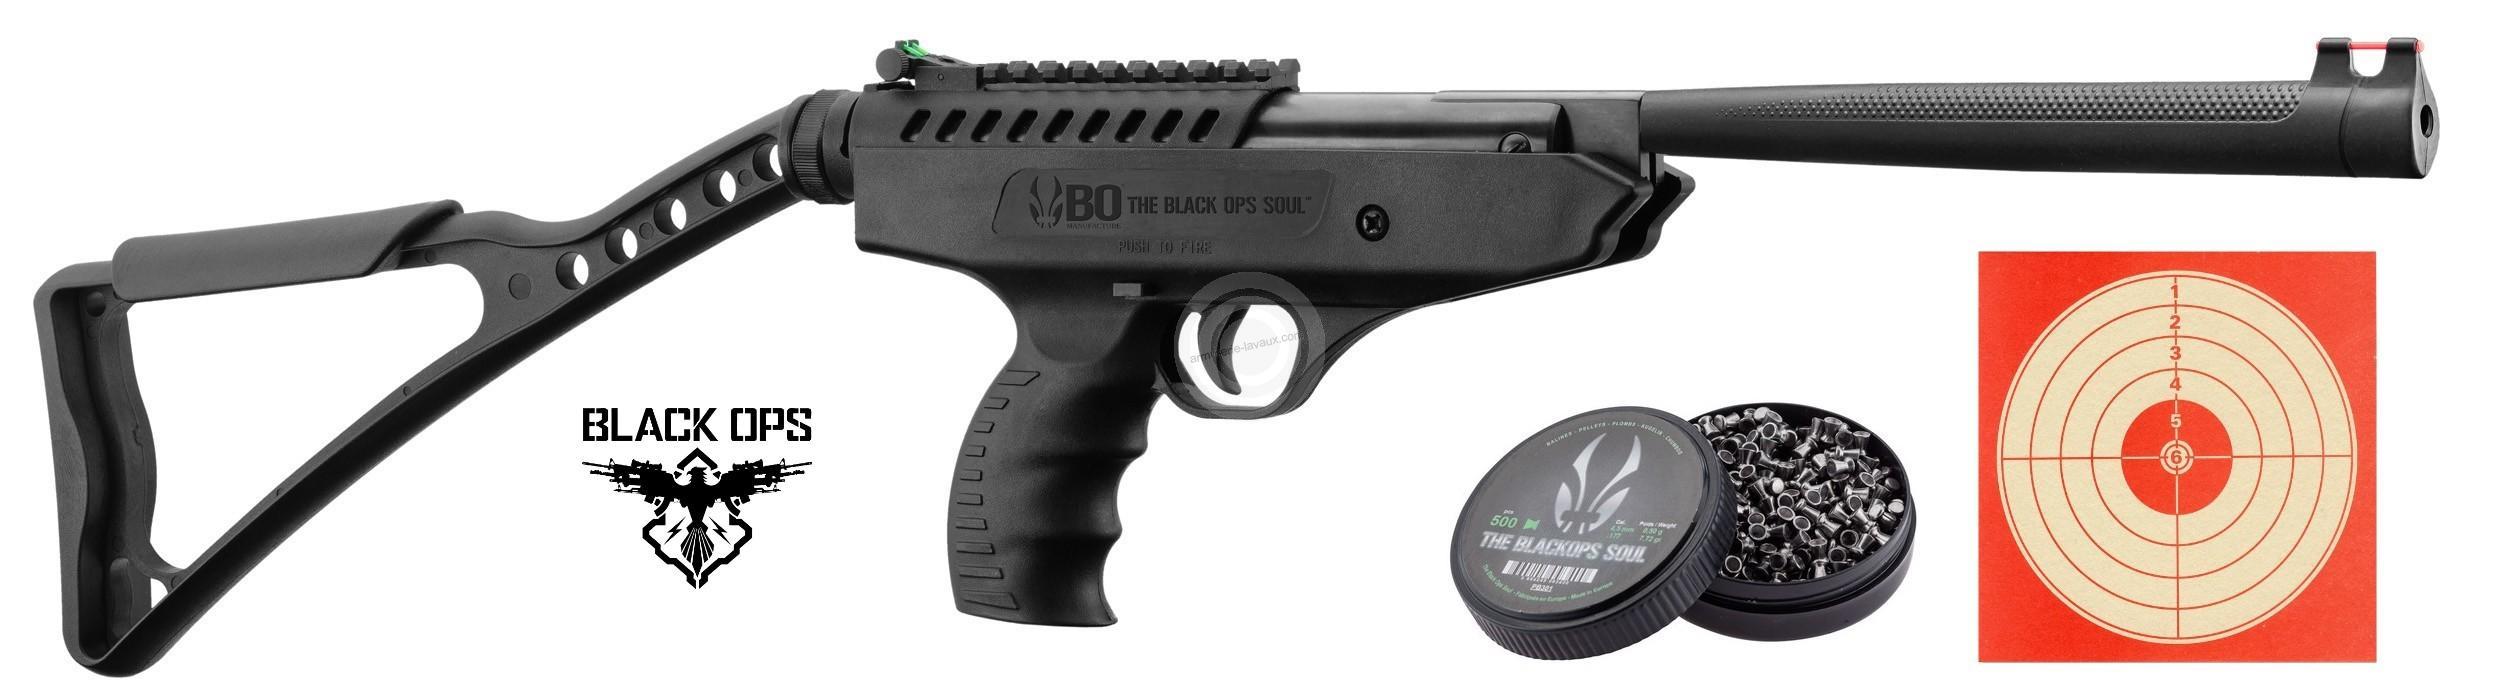 Pistolet à plombs BLACK OPS Langlay Pro Sniper (13.7 joules)